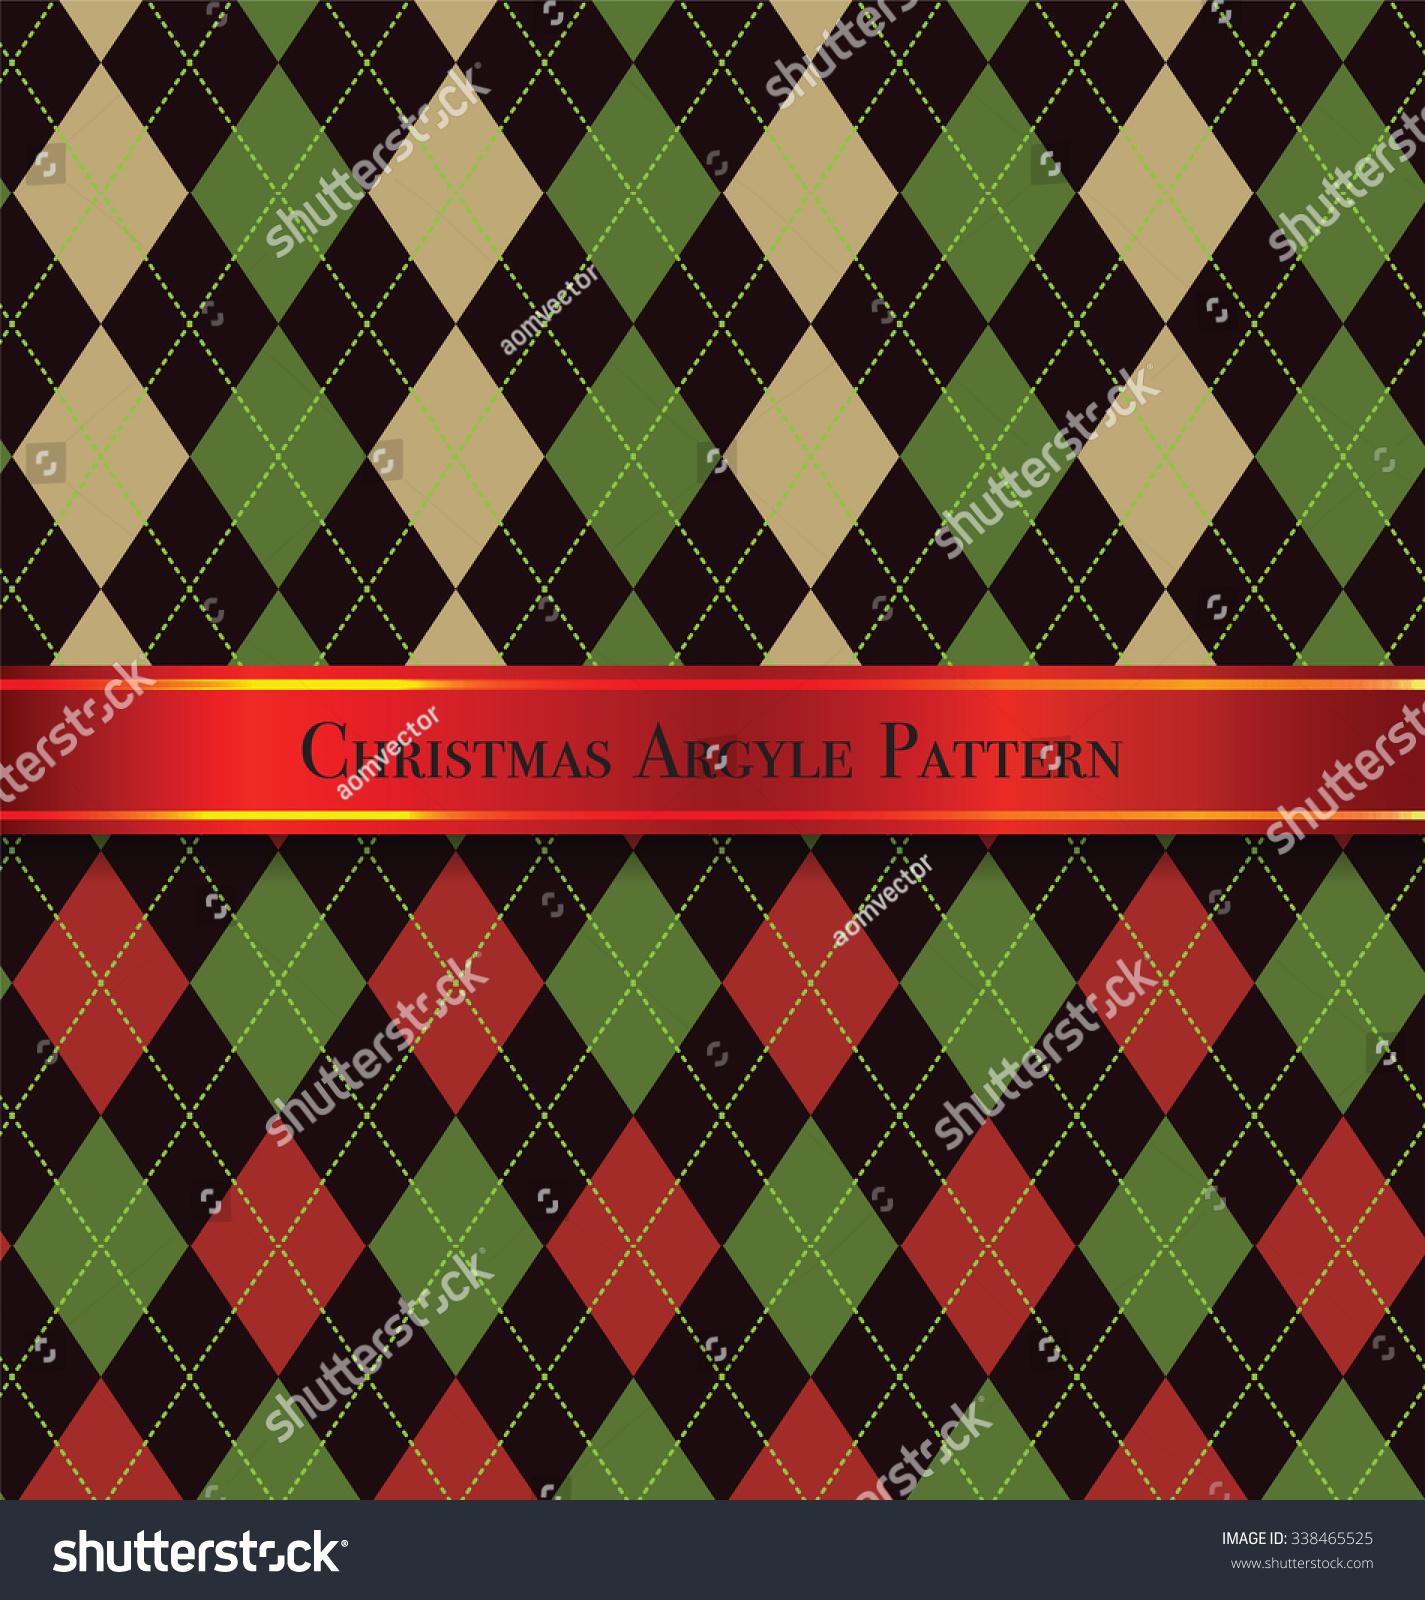 Pics photos merry christmas argyle twitter backgrounds - Christmas Argyle Pattern Design Set 5